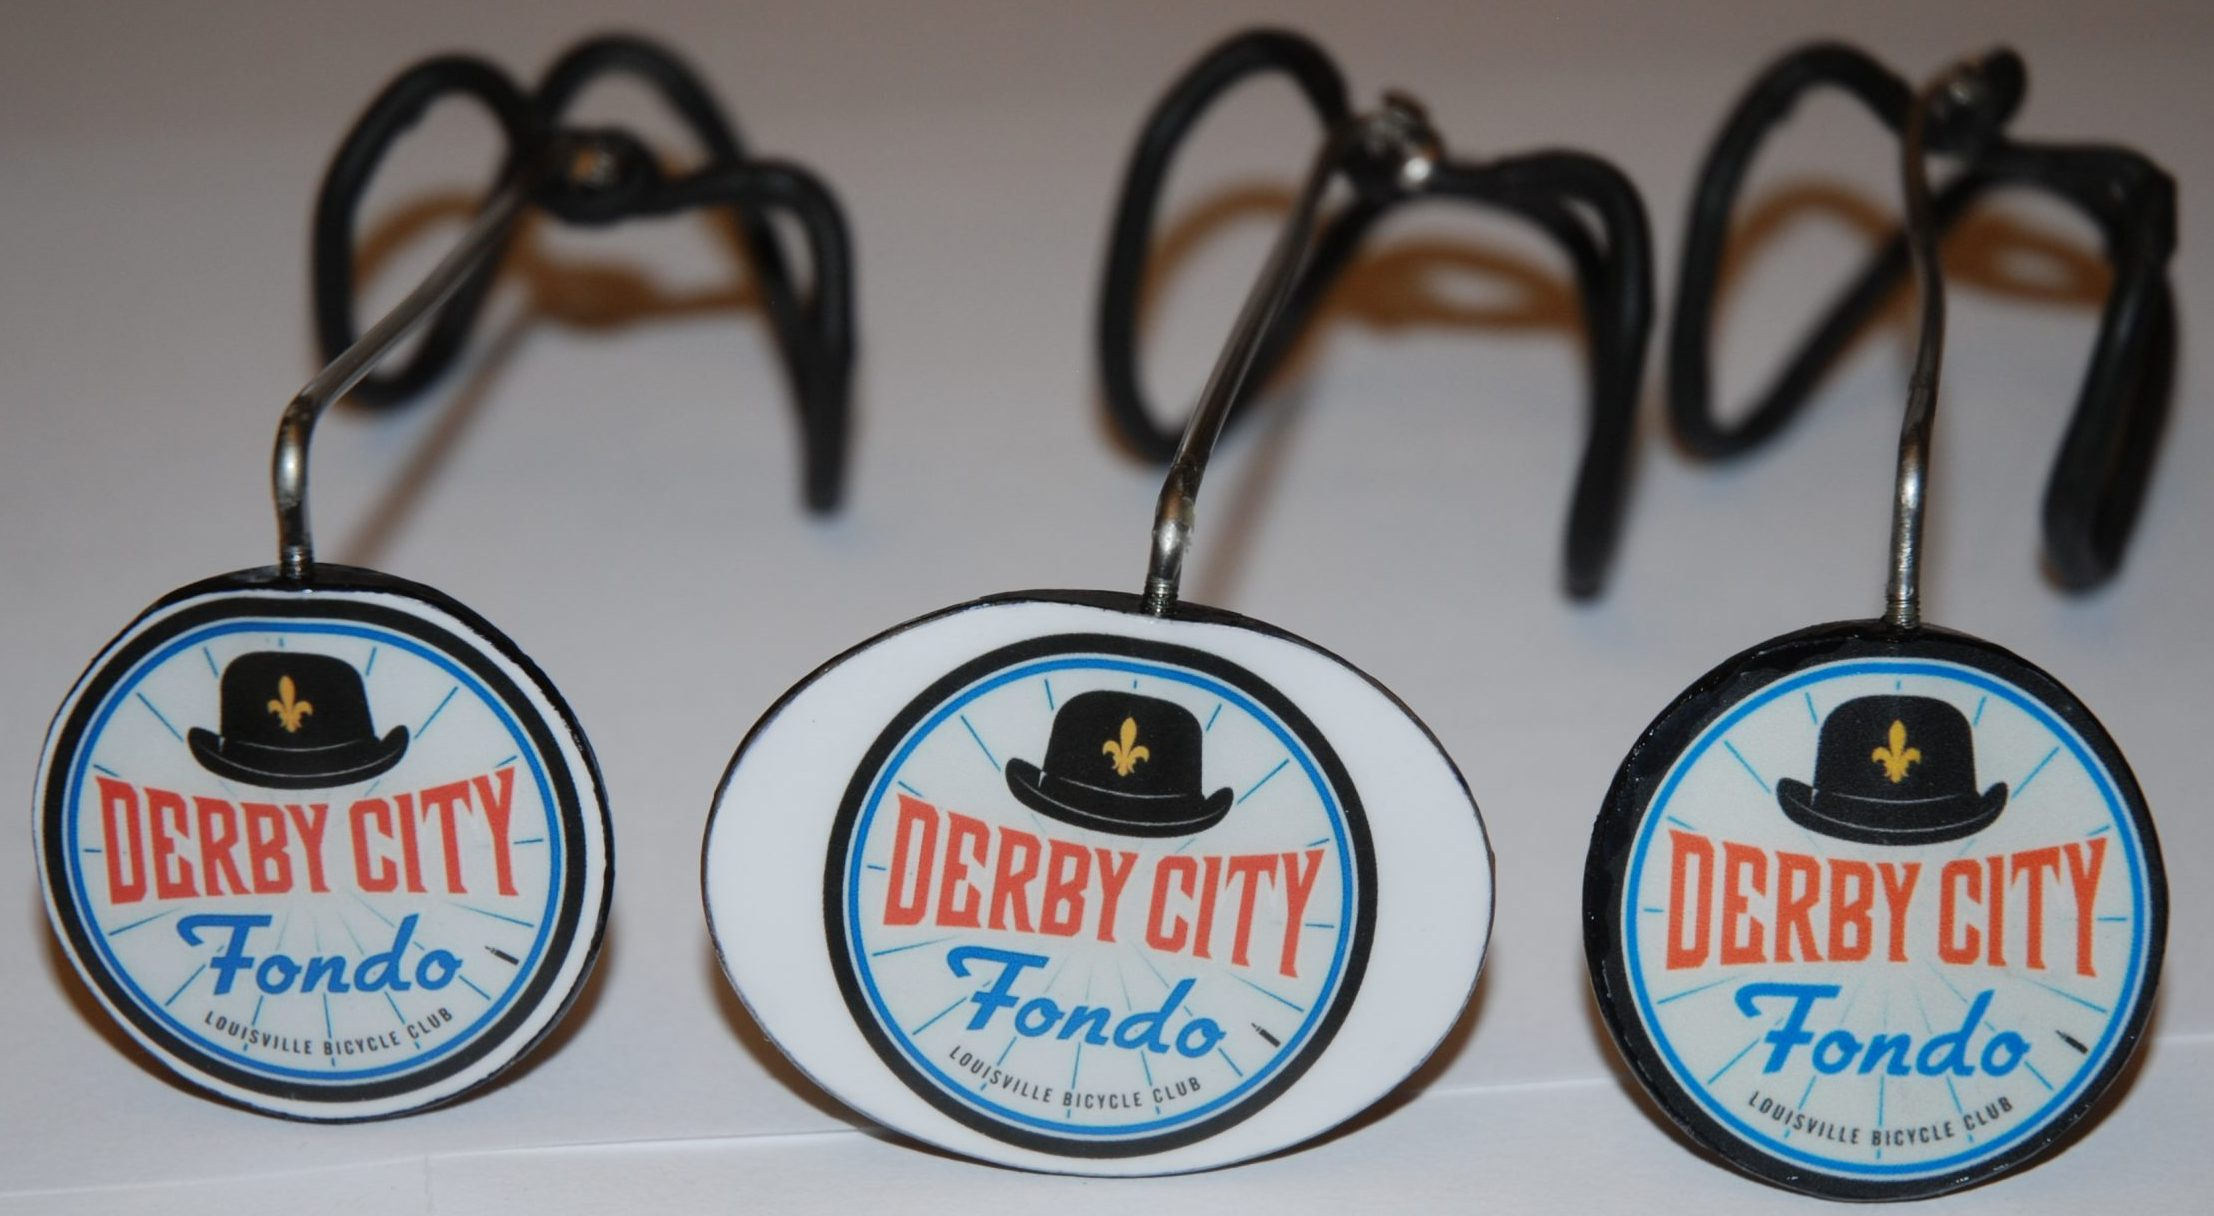 New Derby City Fondo Logo Mirrors